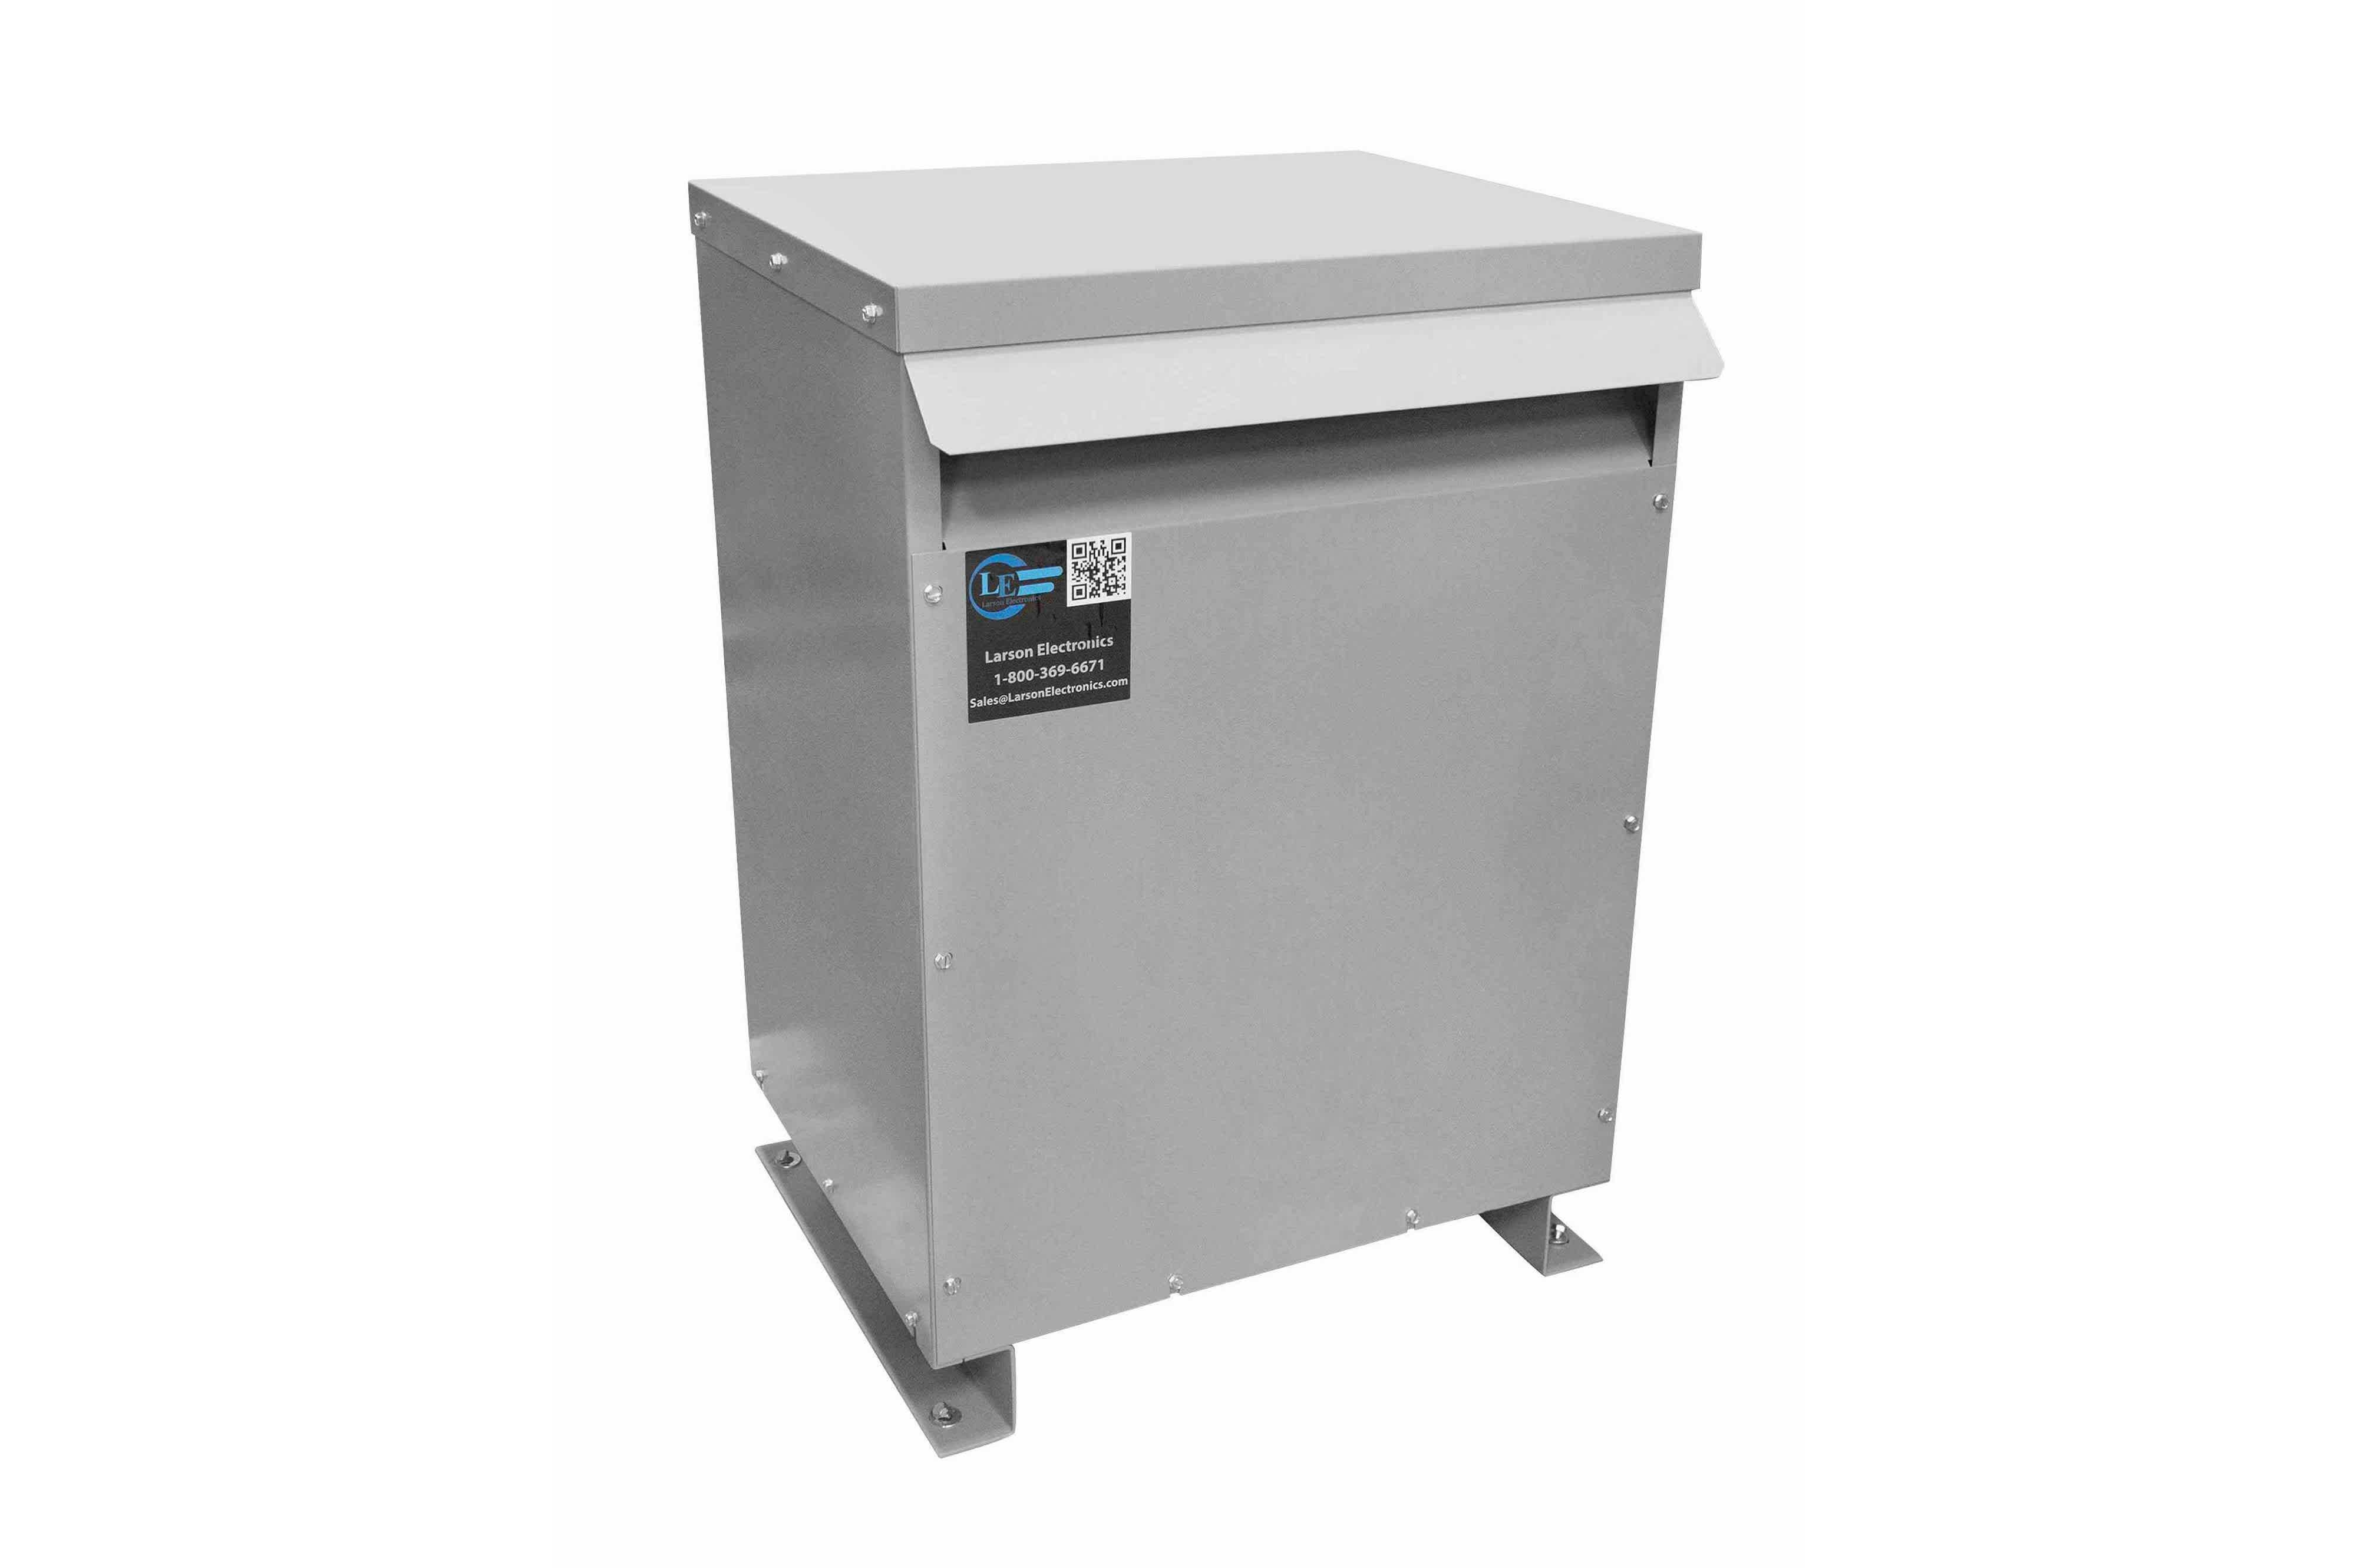 25 kVA 3PH Isolation Transformer, 440V Wye Primary, 208Y/120 Wye-N Secondary, N3R, Ventilated, 60 Hz